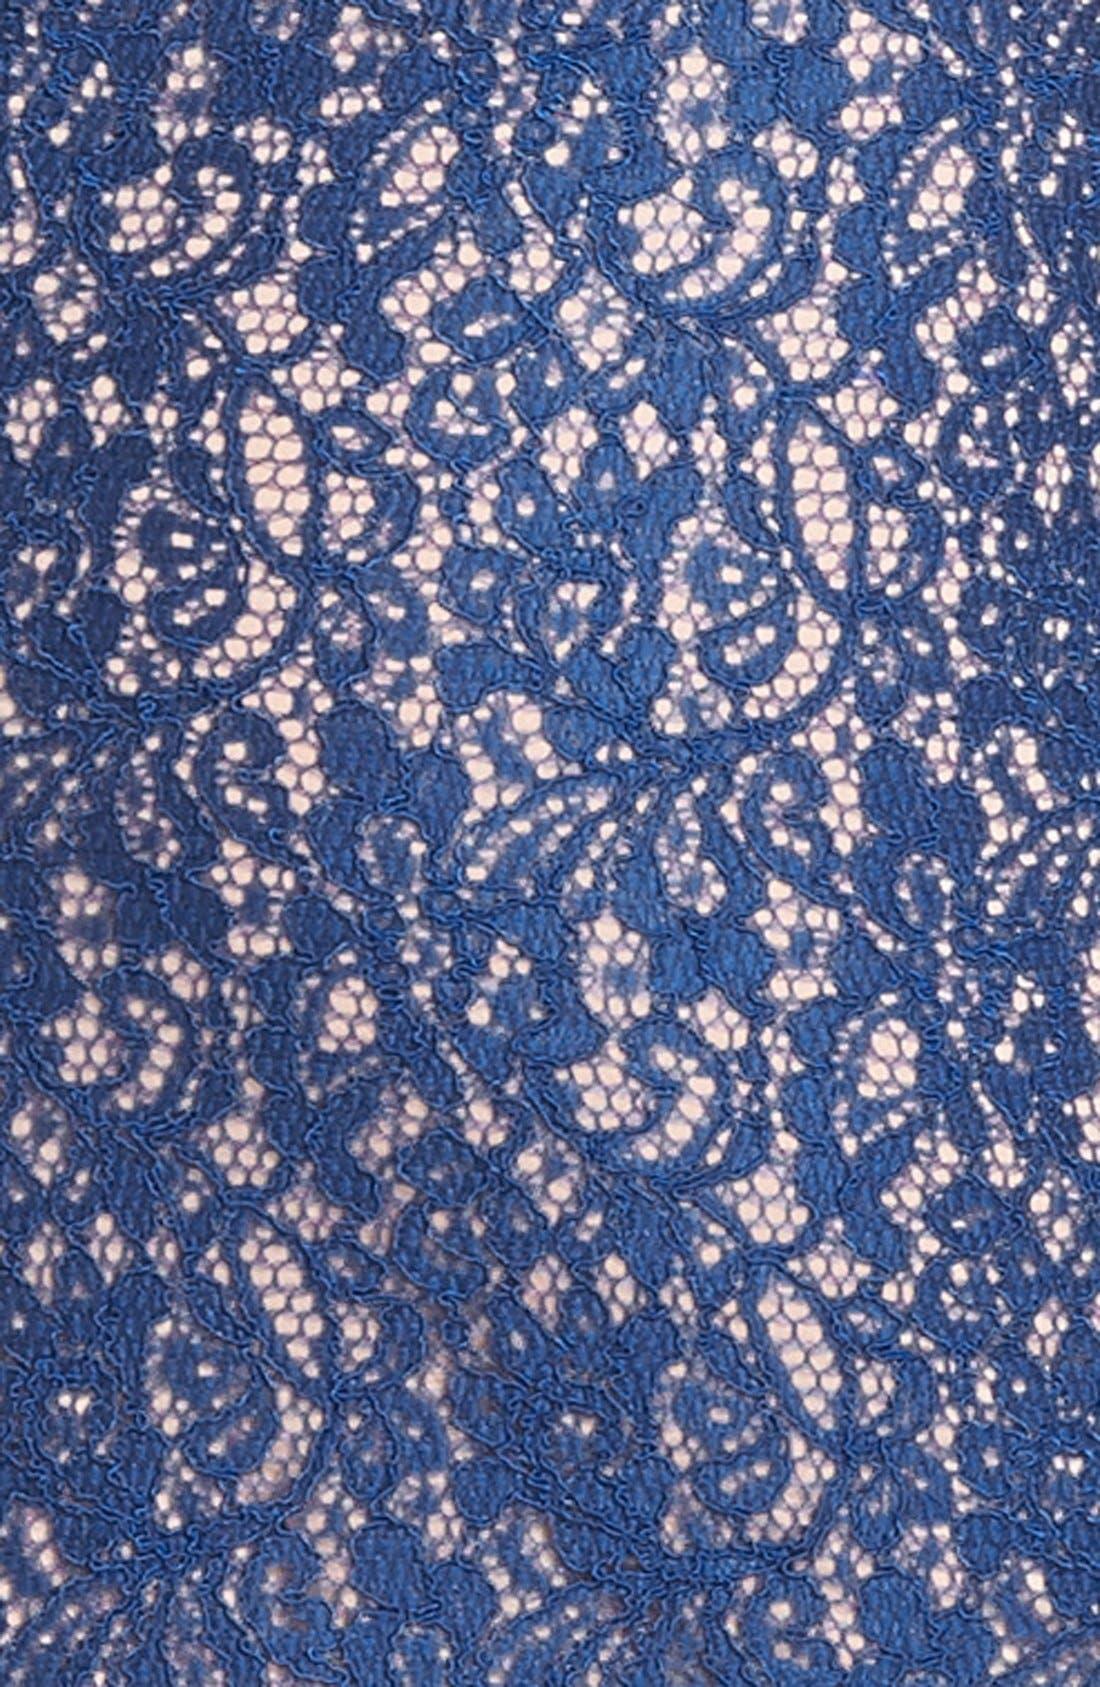 Boatneck Lace Sheath Dress,                             Alternate thumbnail 163, color,